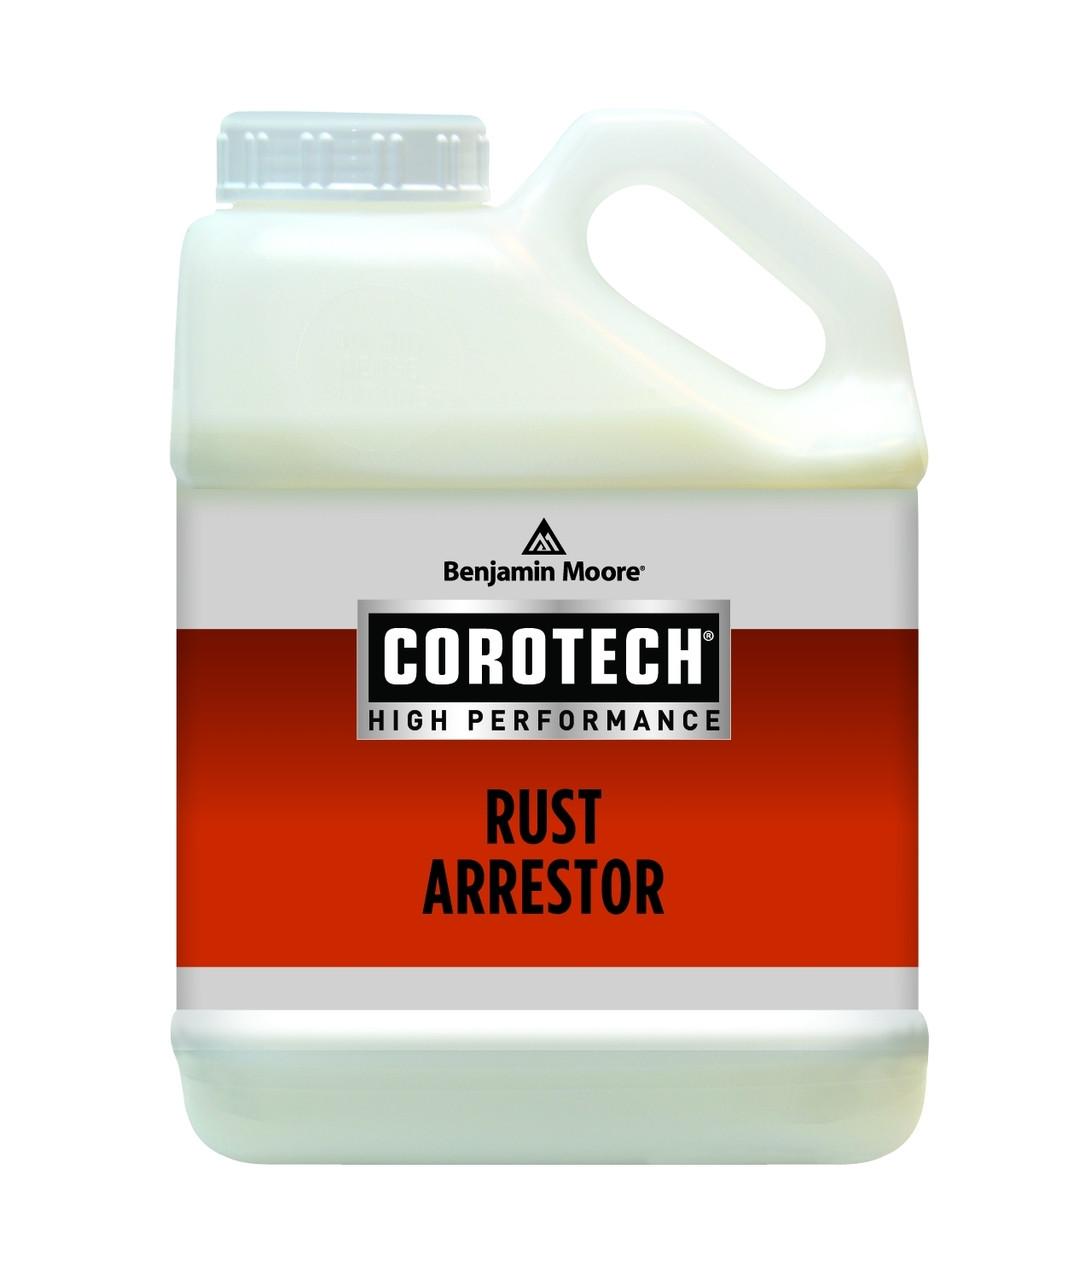 Corotech rust arrestor gallon southern paint supply co for Southern paint supply